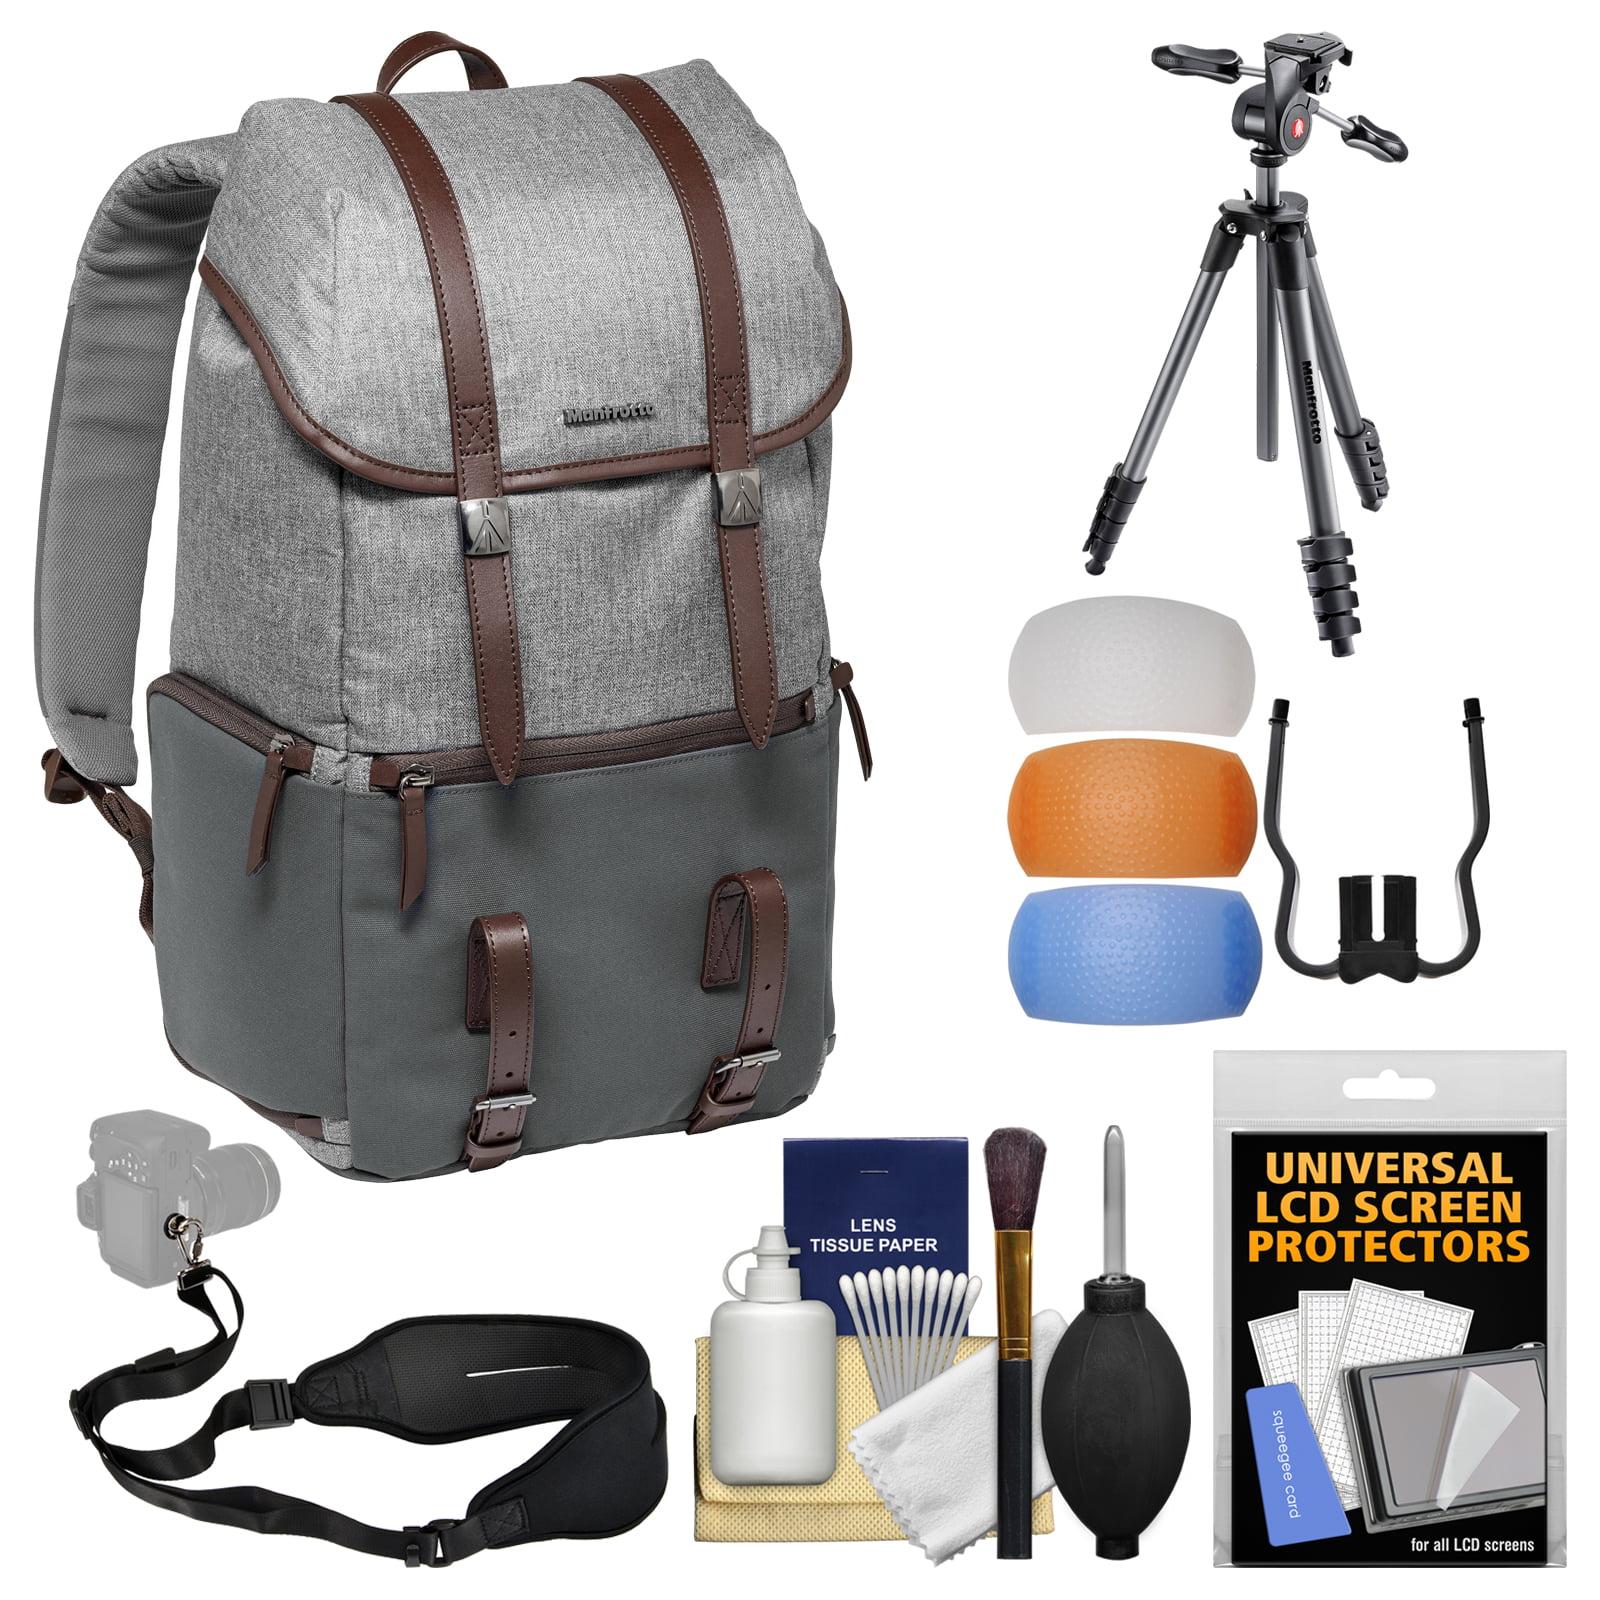 MANFROTTO Lifestyle Windsor Digital SLR Camera Backpack p...